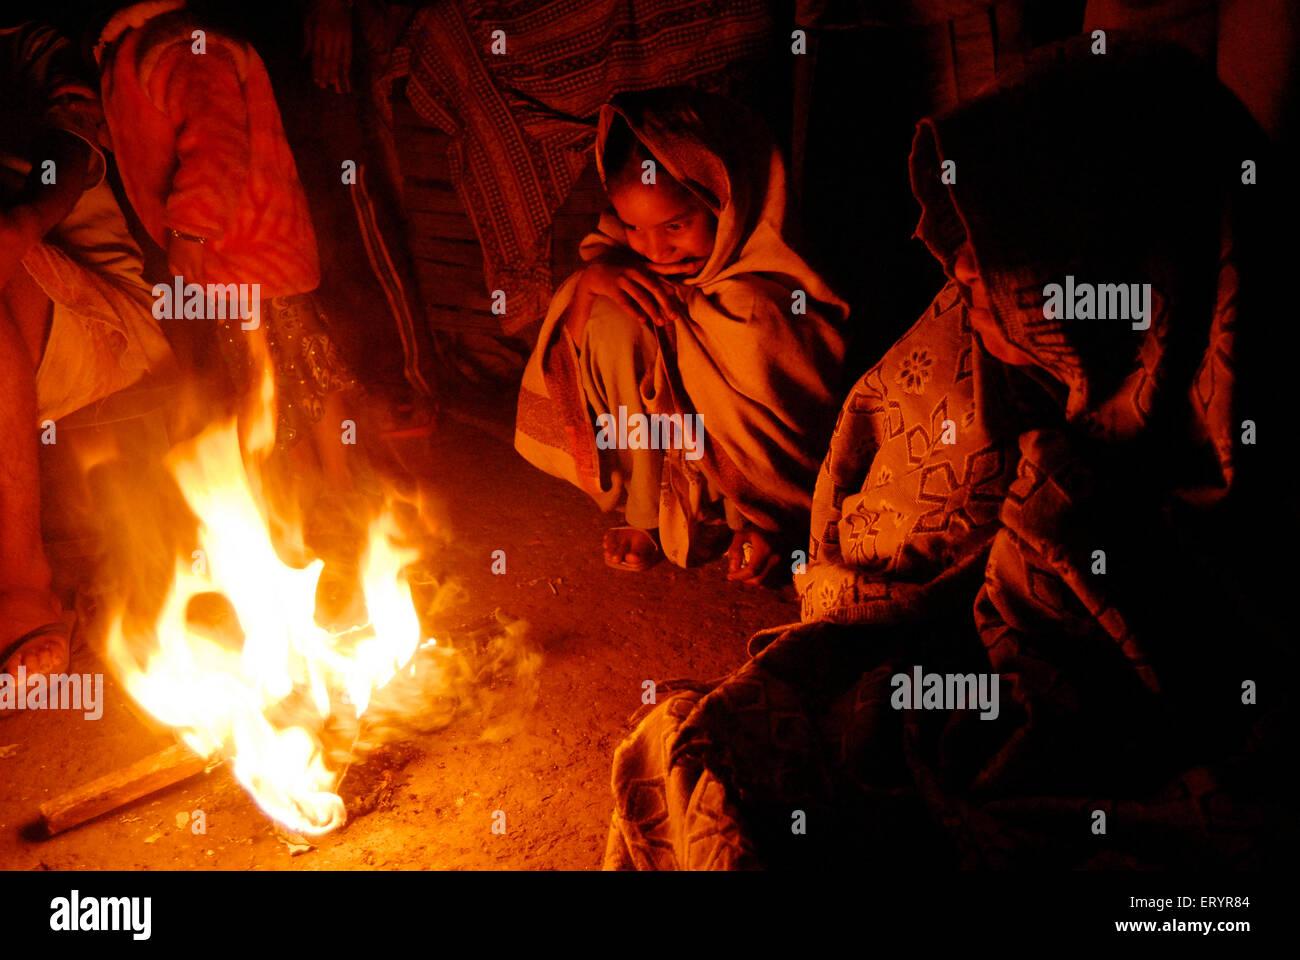 Hutment or slum dwellers sit around bonfire warming in winter season - Stock Image